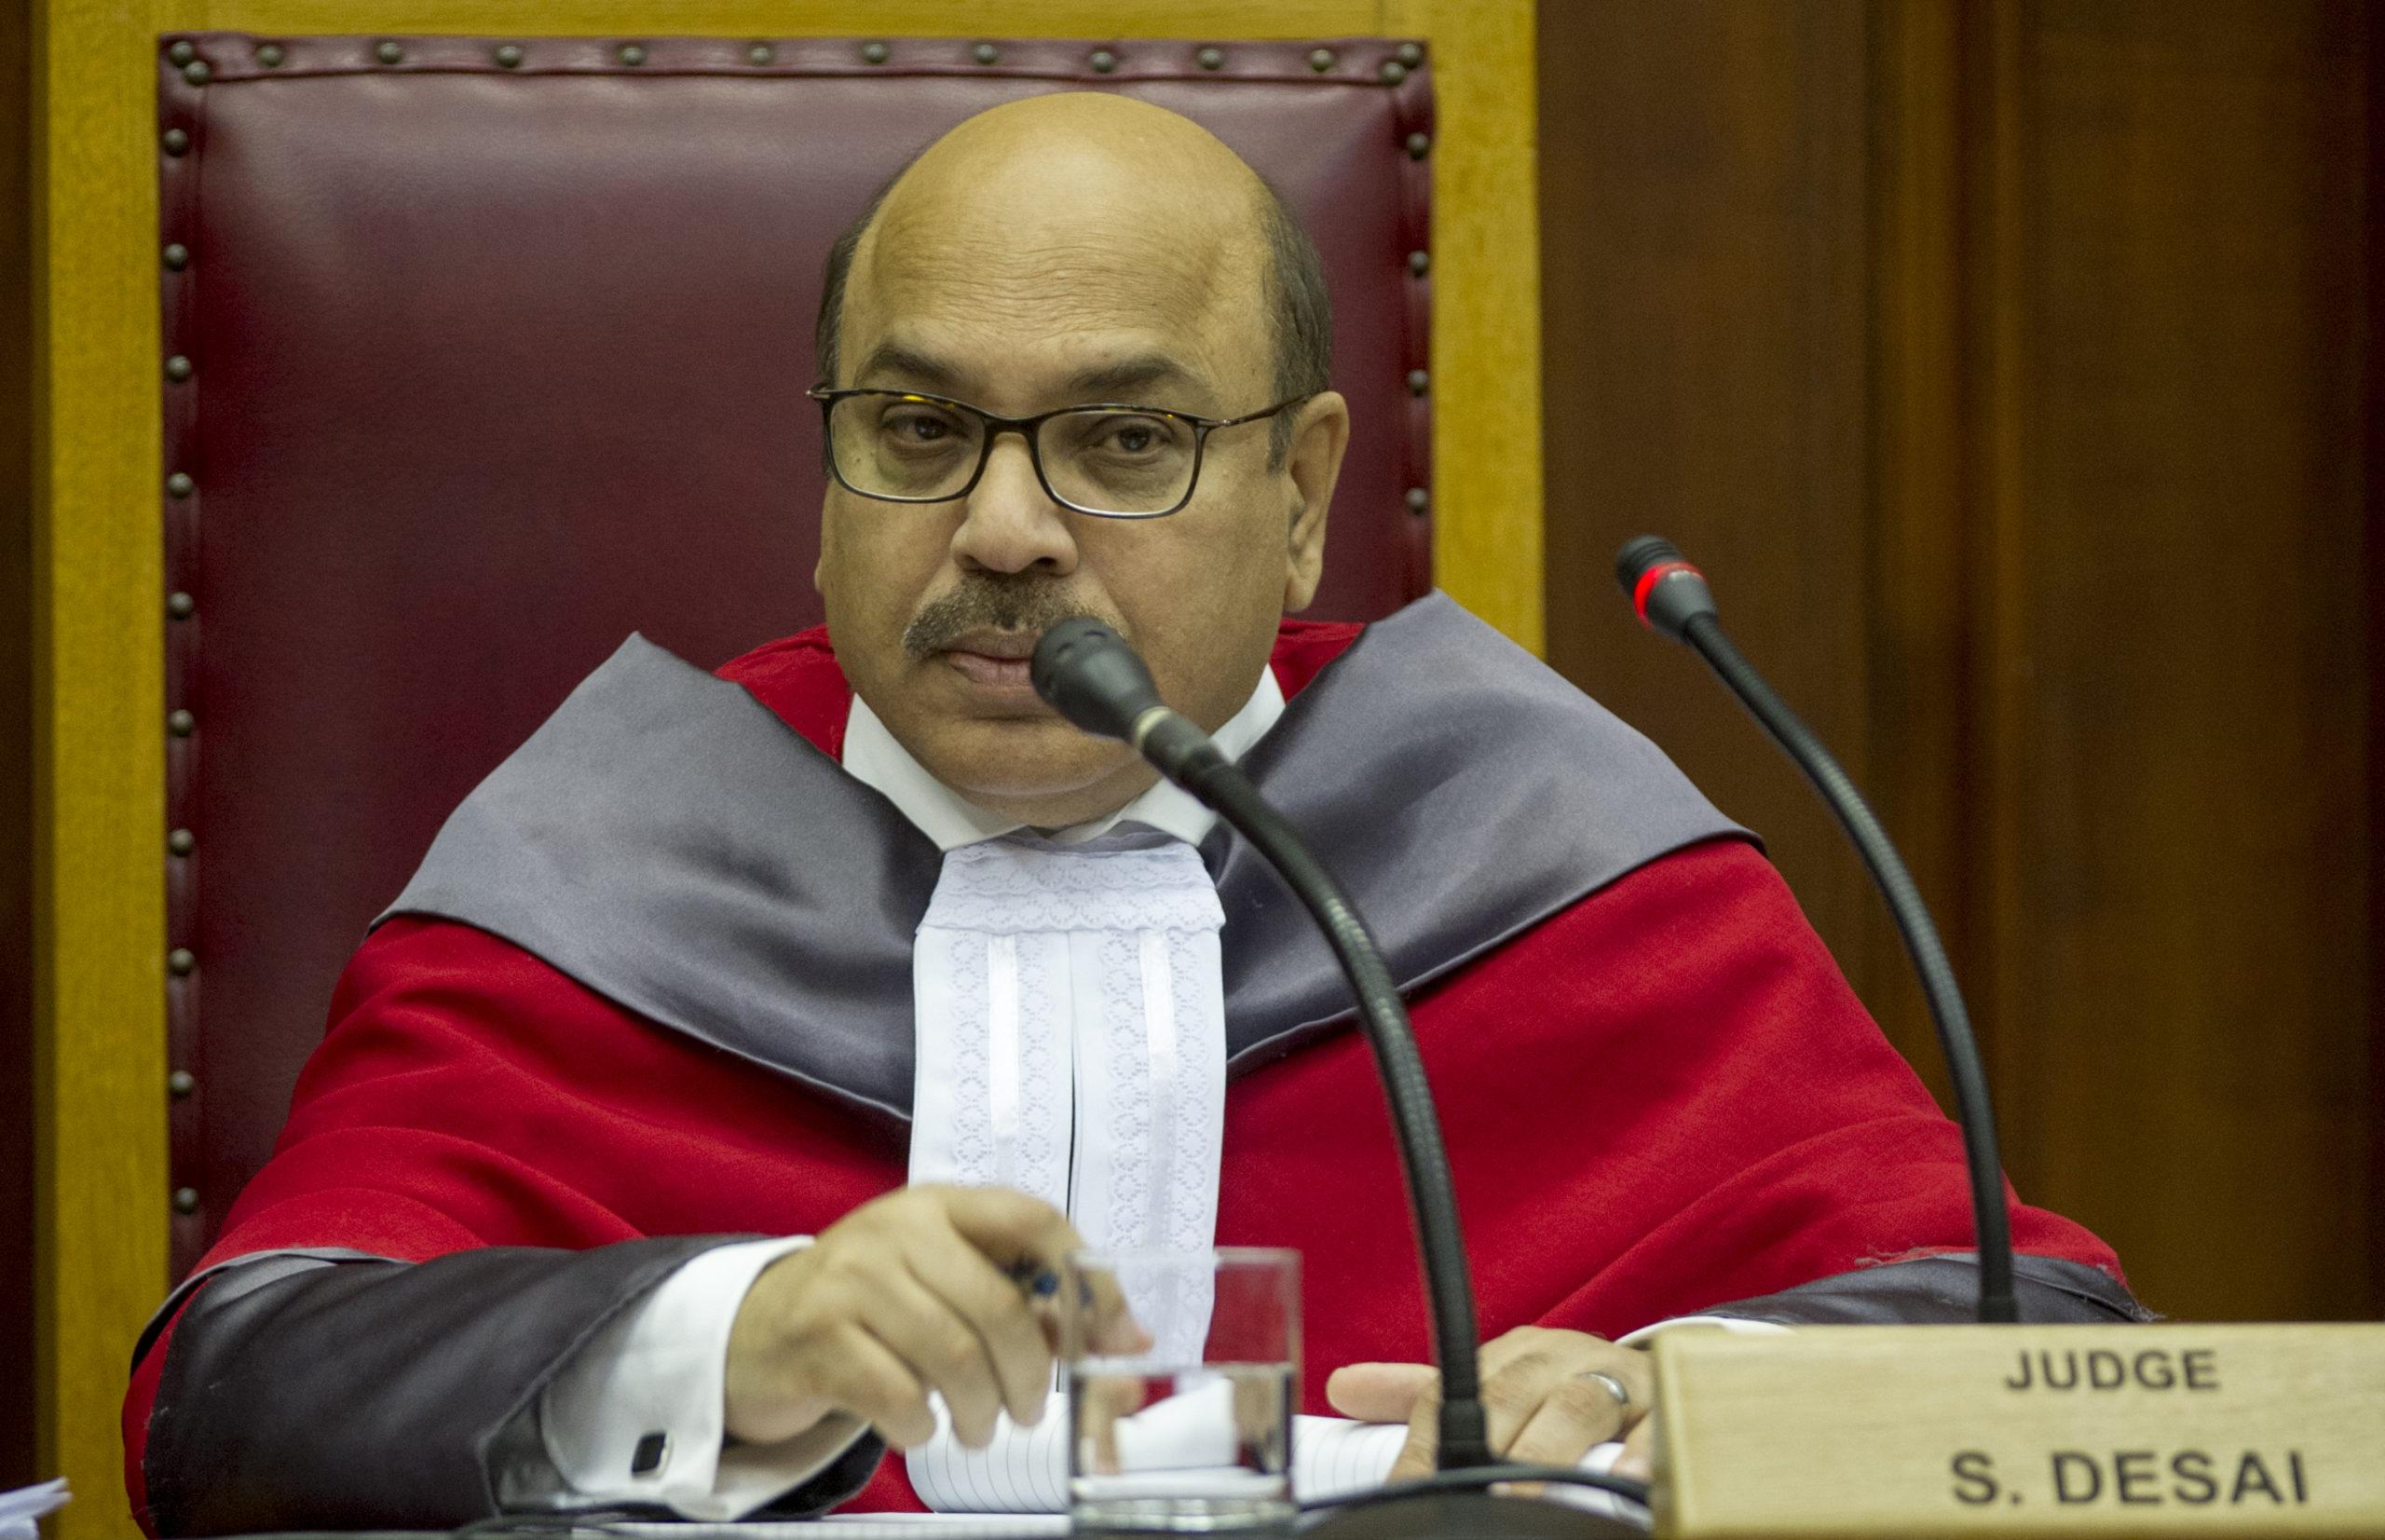 Jewish lobby complains against judge Desai over pro-Palestine stance - The Citizen